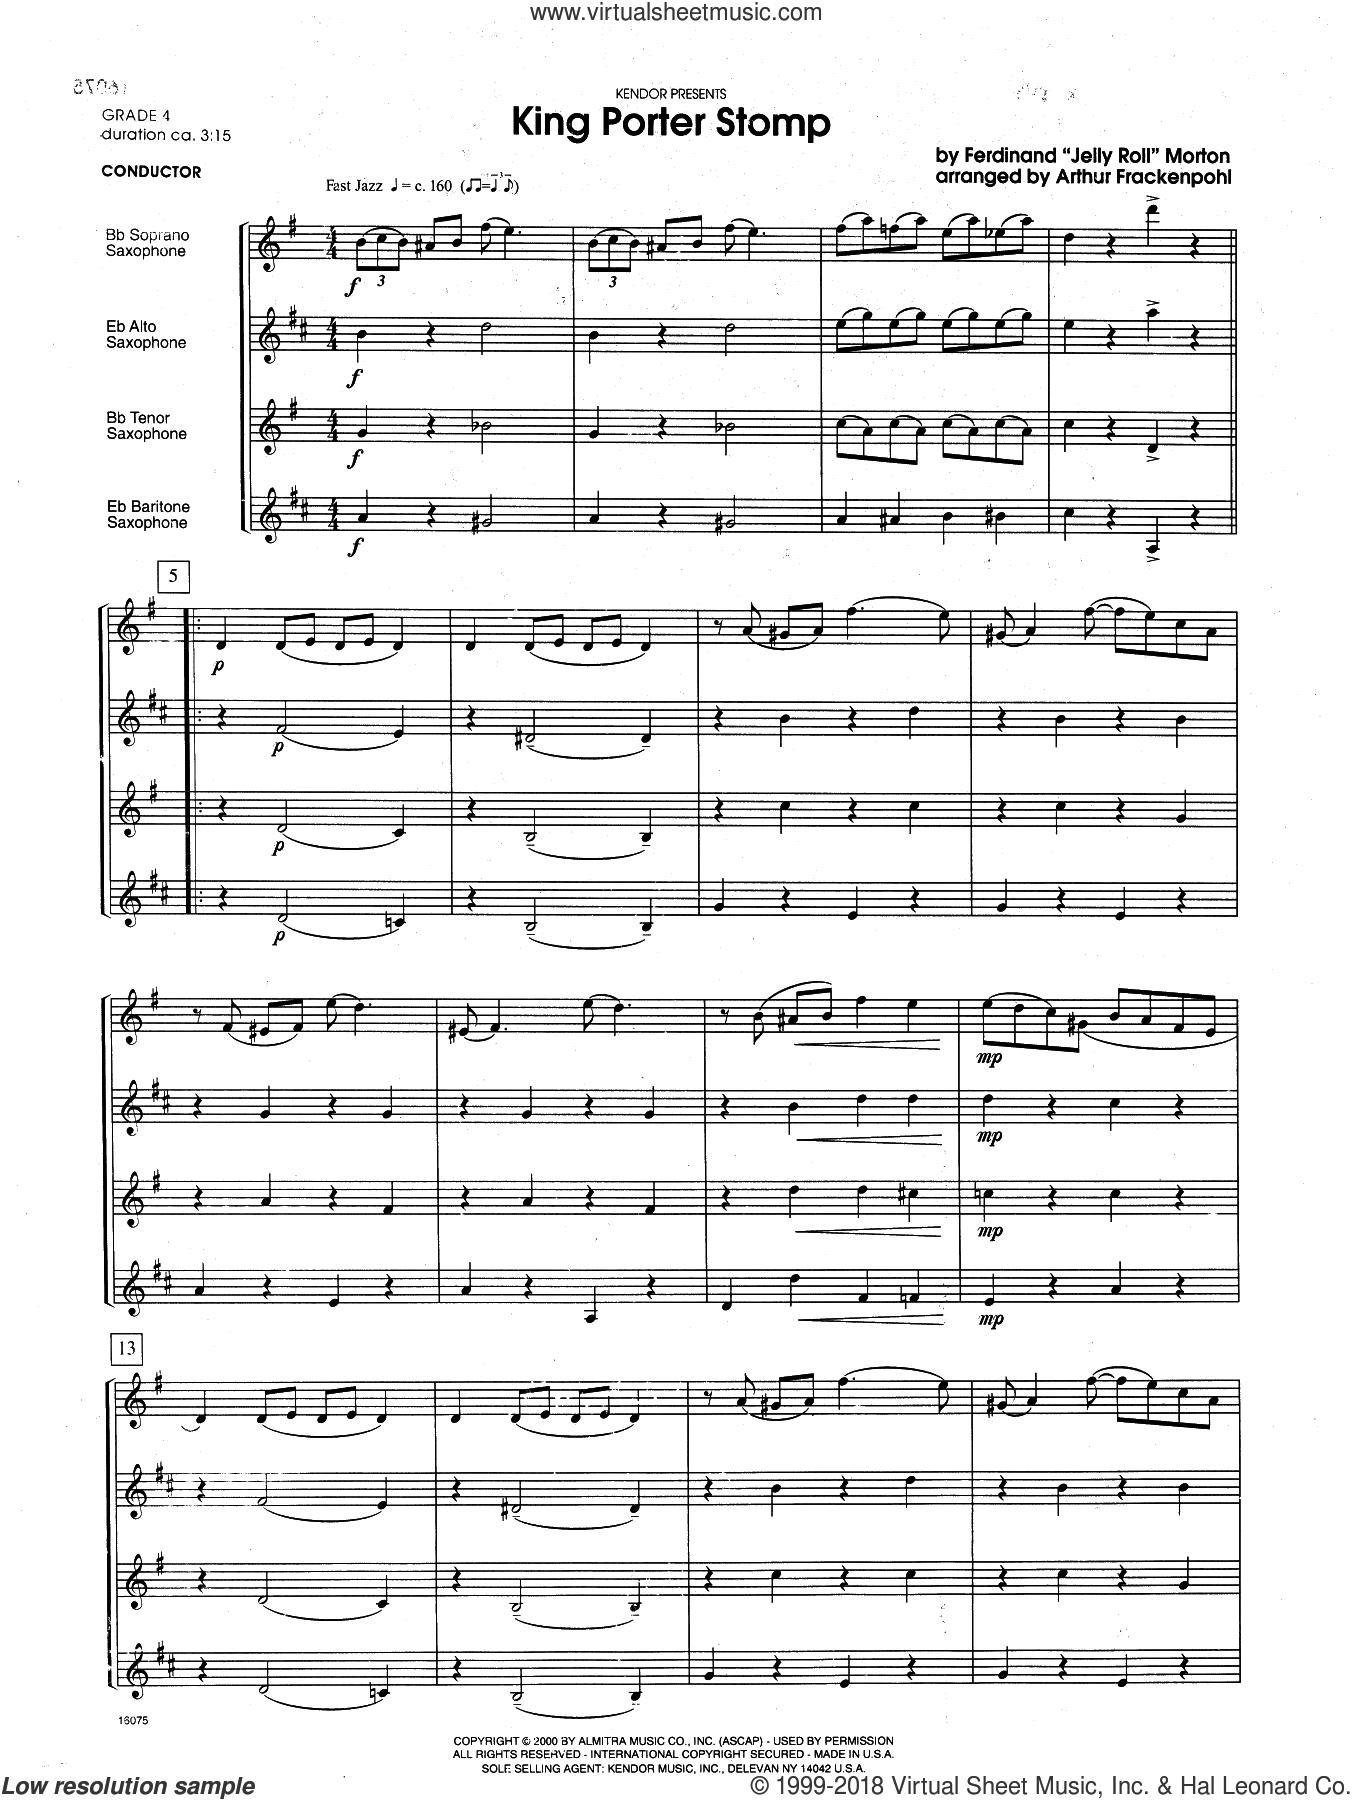 Frackenpohl King Porter Stomp Sheet Music Complete Collection For Saxophone Quartet